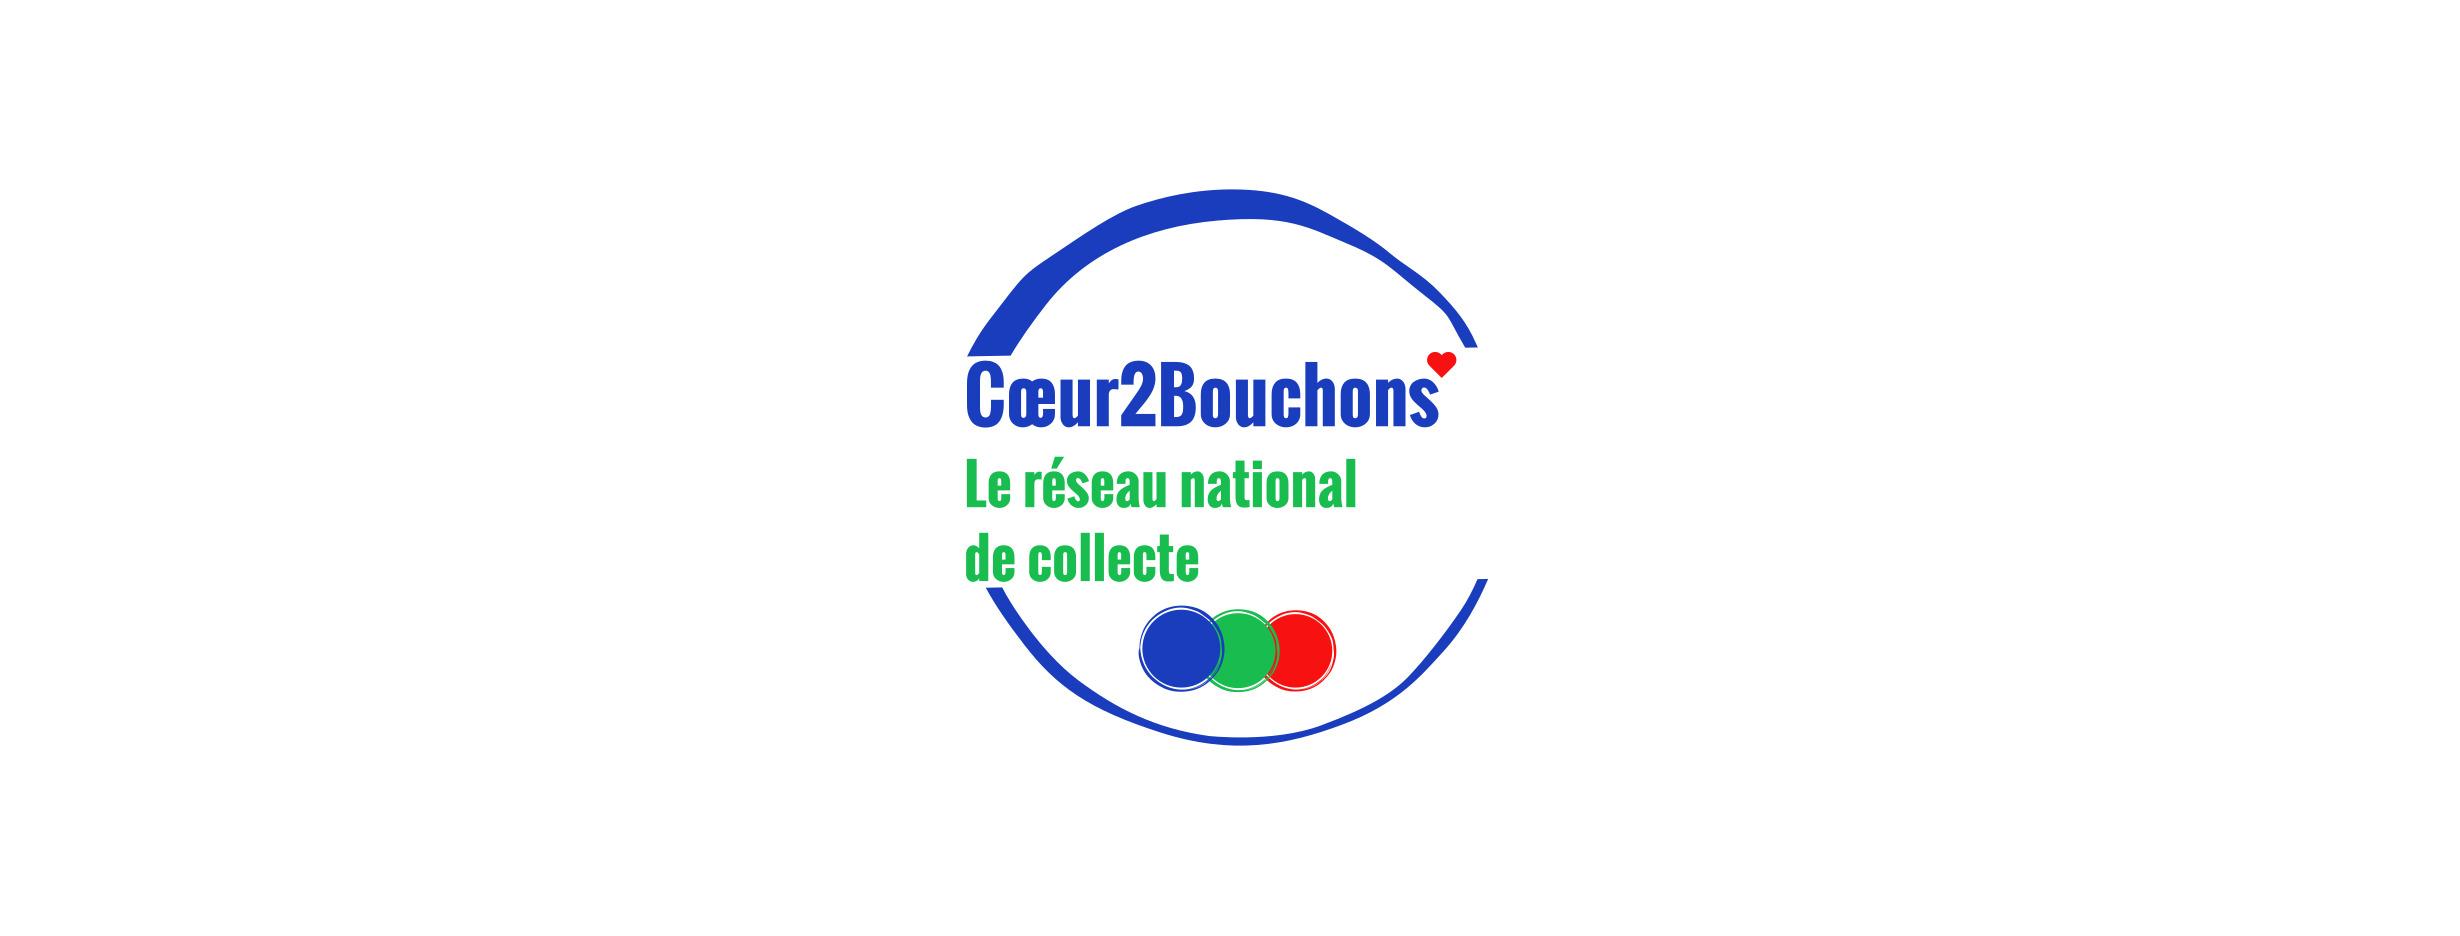 Logo Coeur2Bouchons